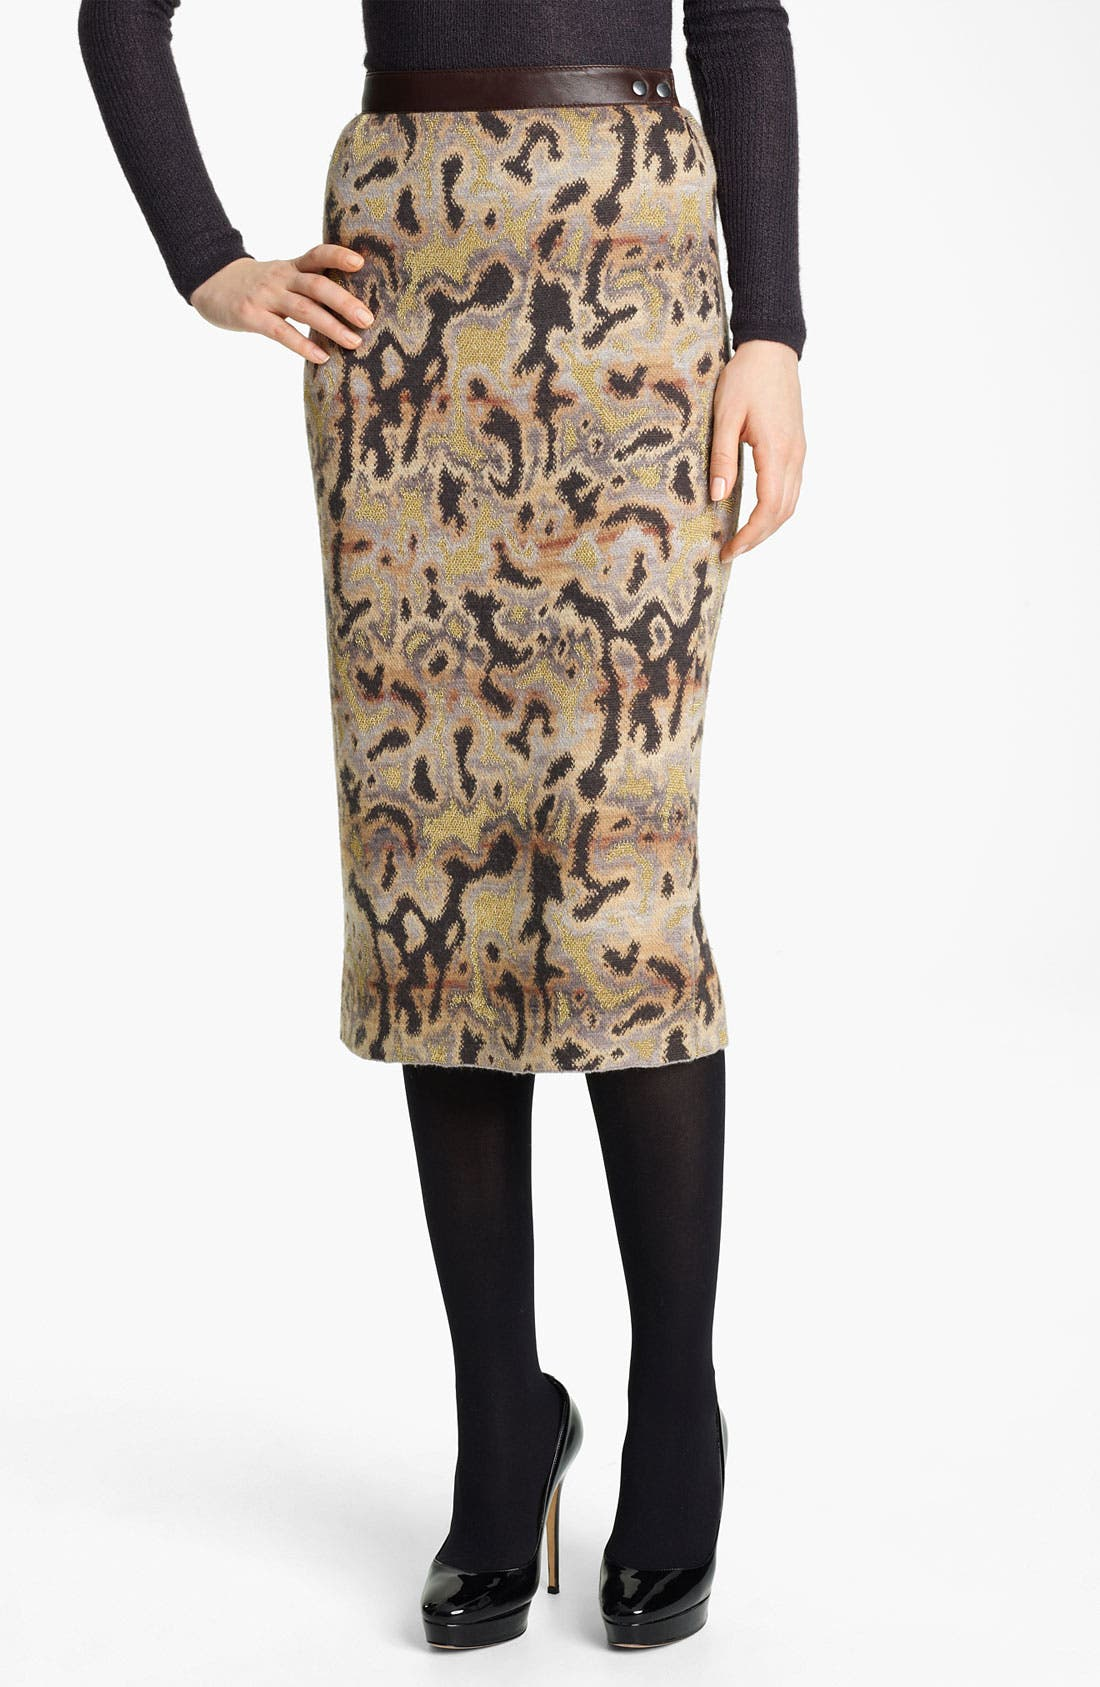 Alternate Image 1 Selected - Missoni Marble Stitch Pencil Skirt